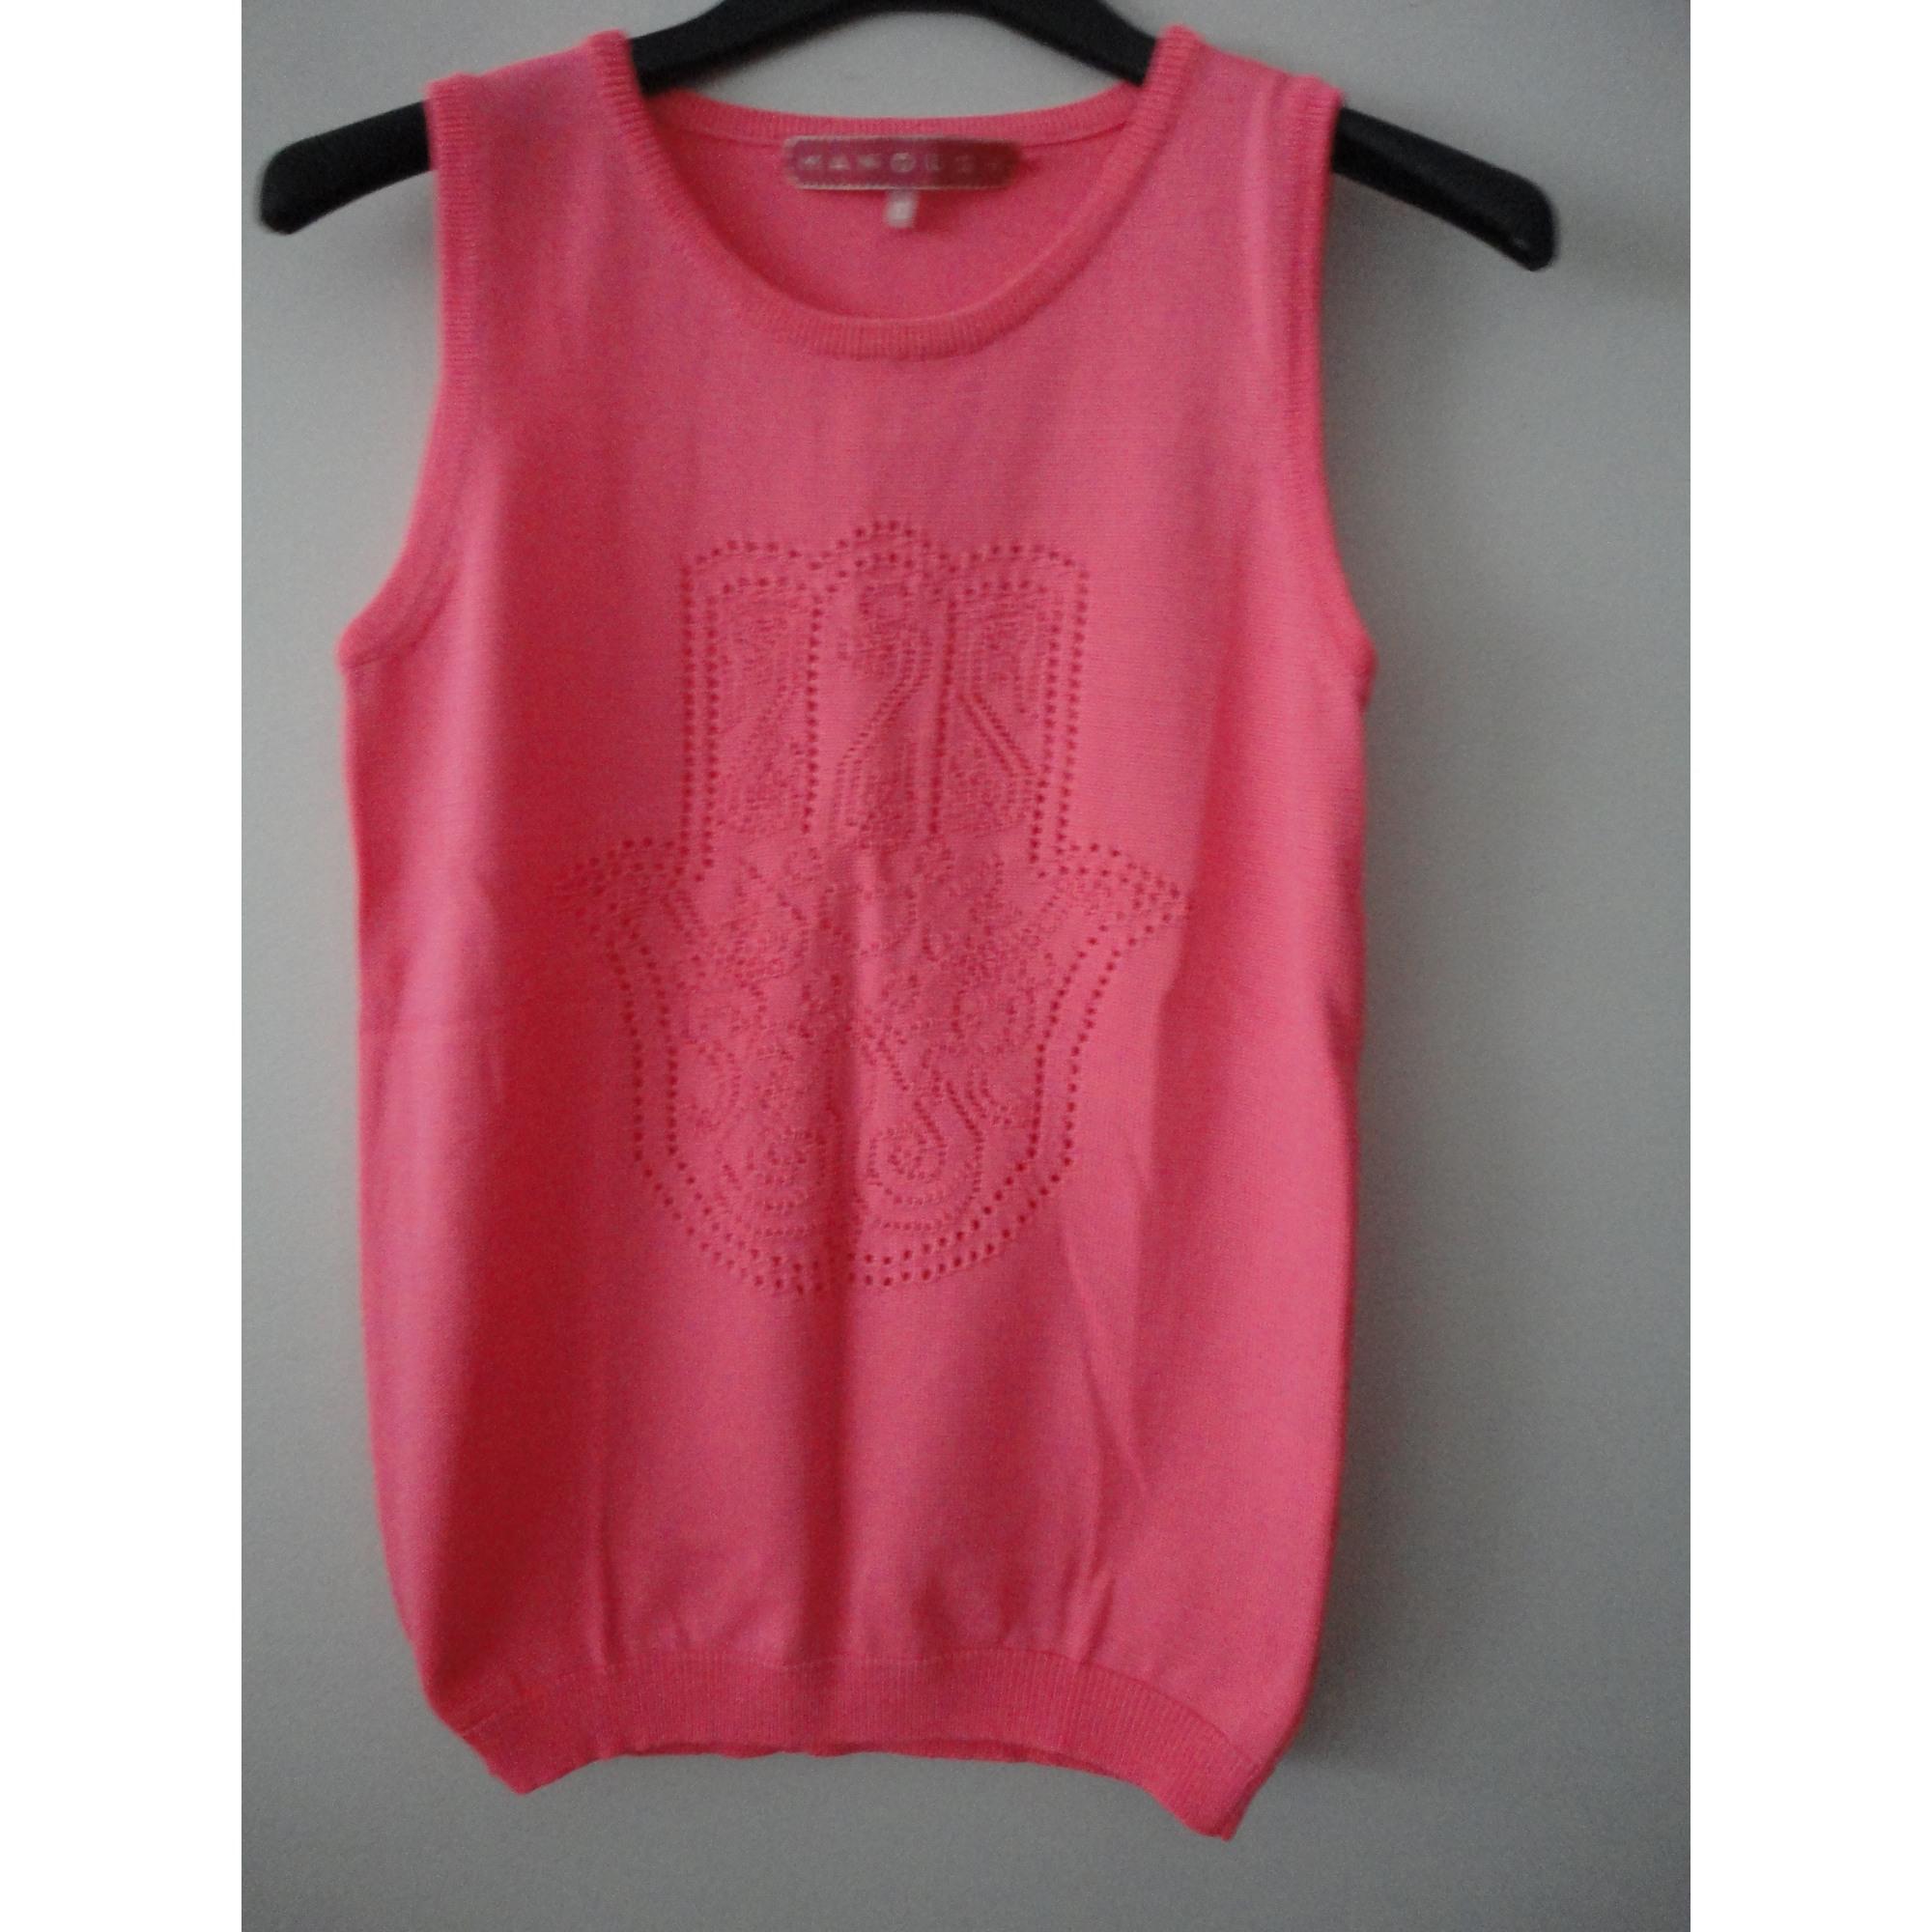 Top, tee-shirt MARQUE INCONNUE Rose, fuschia, vieux rose